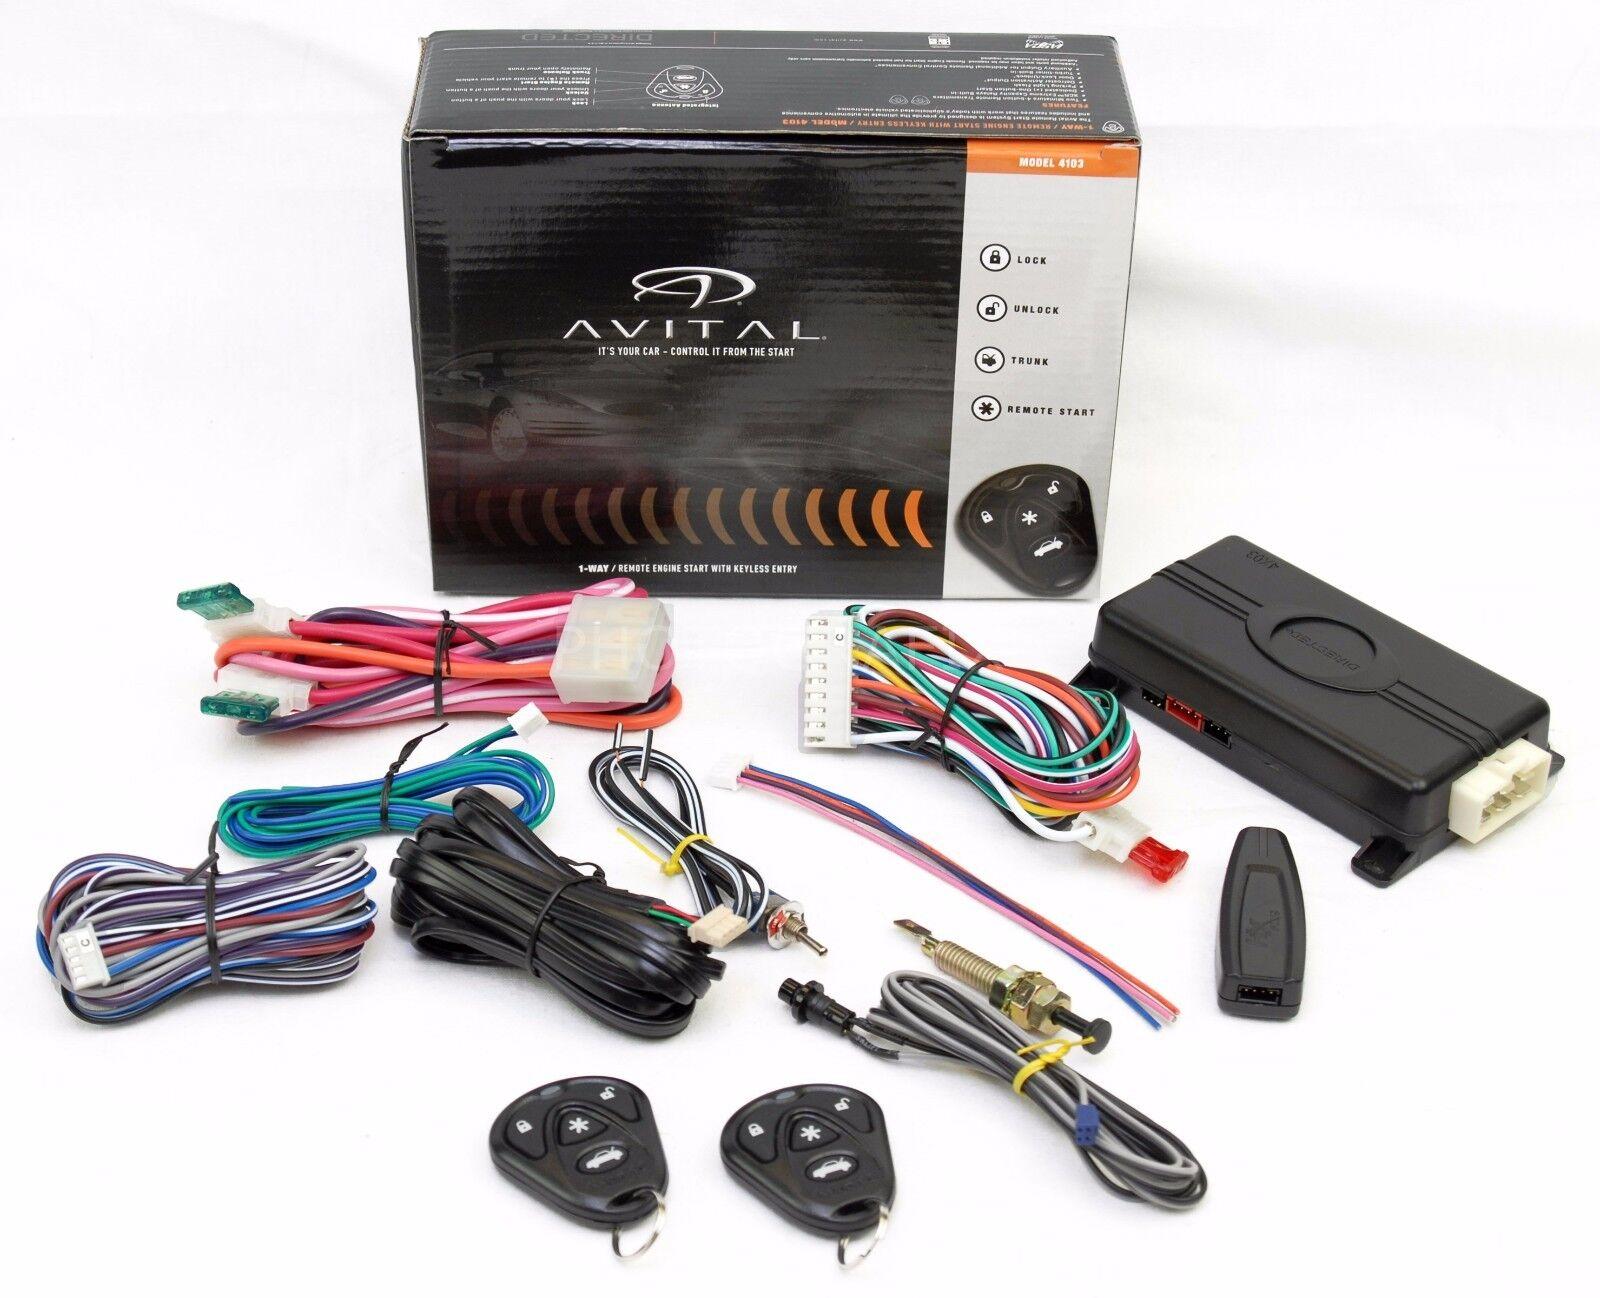 viper car alarm system wiring diagram 4105